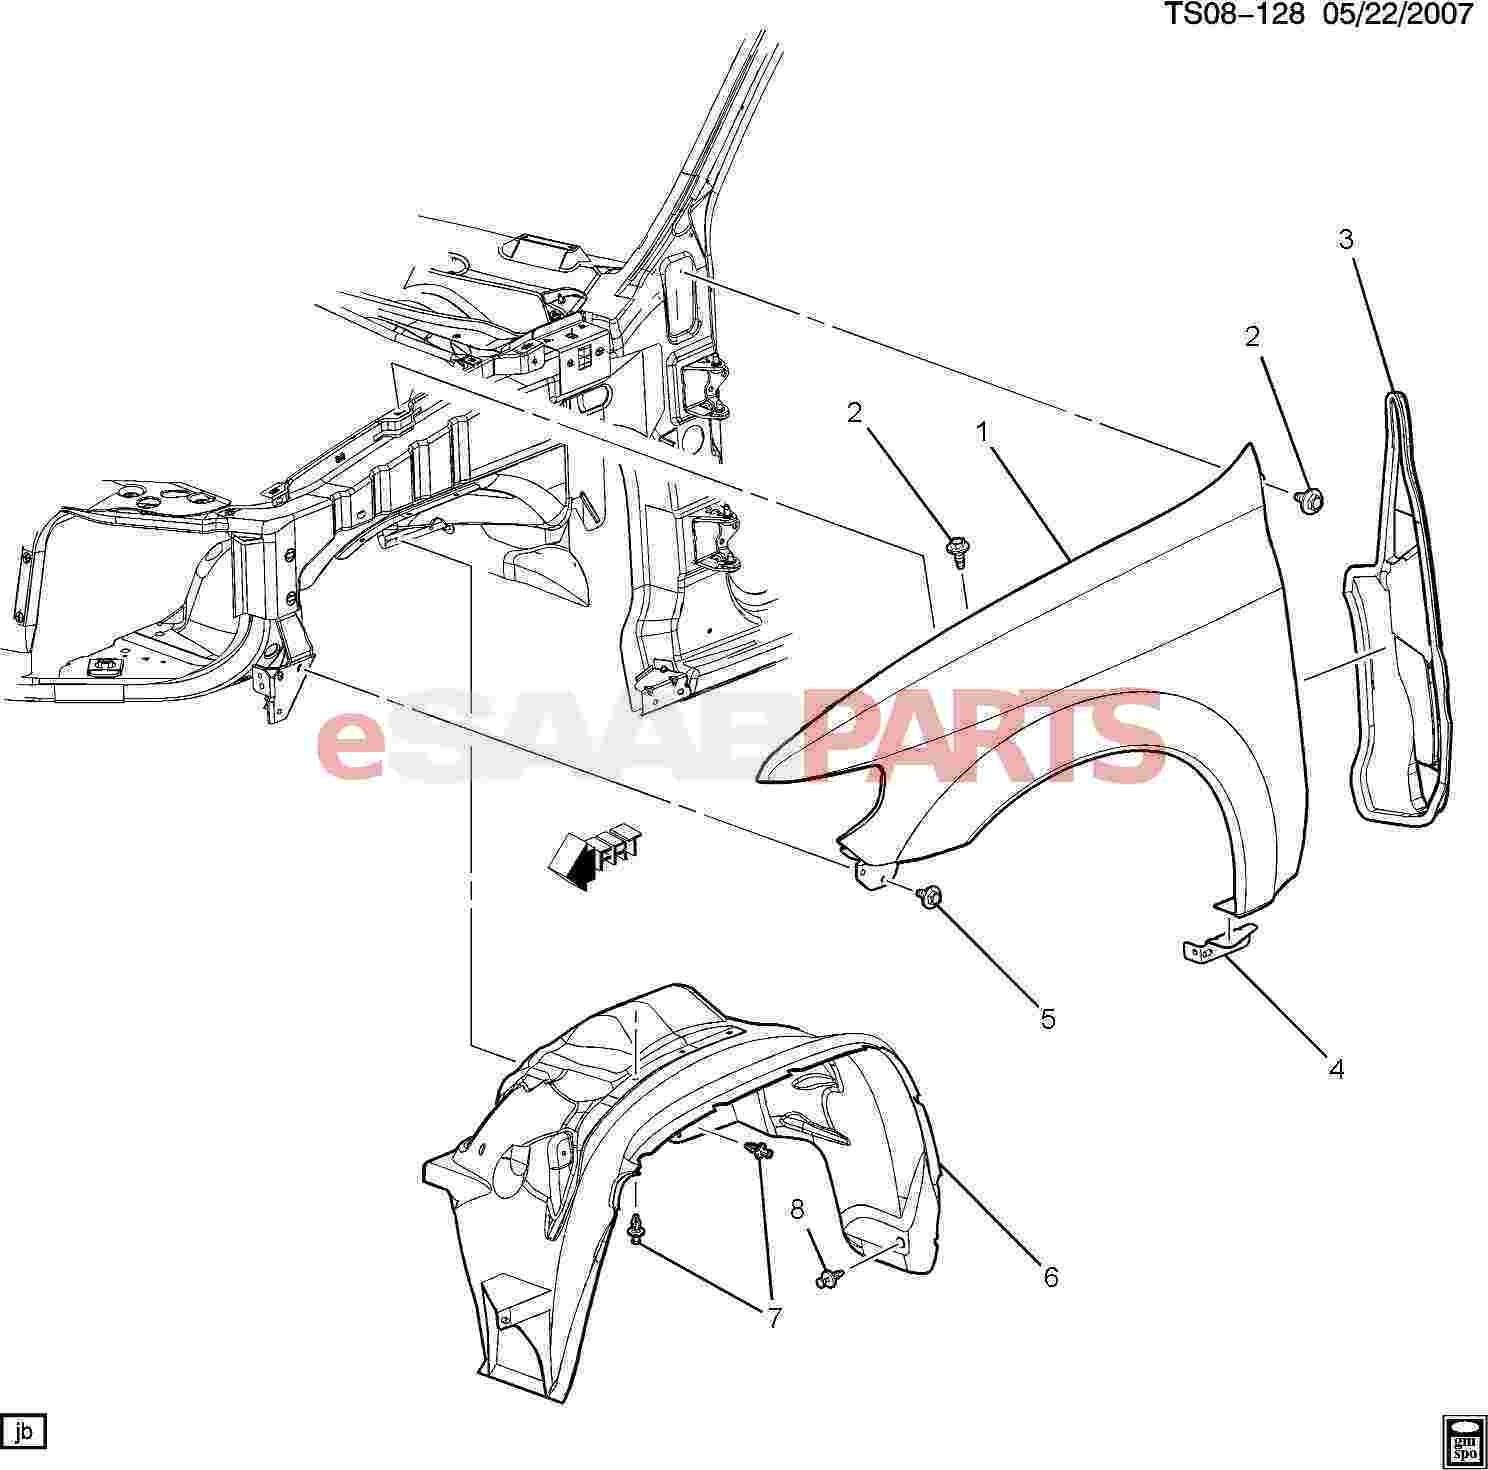 Car Front End Parts Diagram ] Saab Bolt Washer M6x1x15 5 75 Thd 17 Od 8 8 Gmw3359 Of Car Front End Parts Diagram